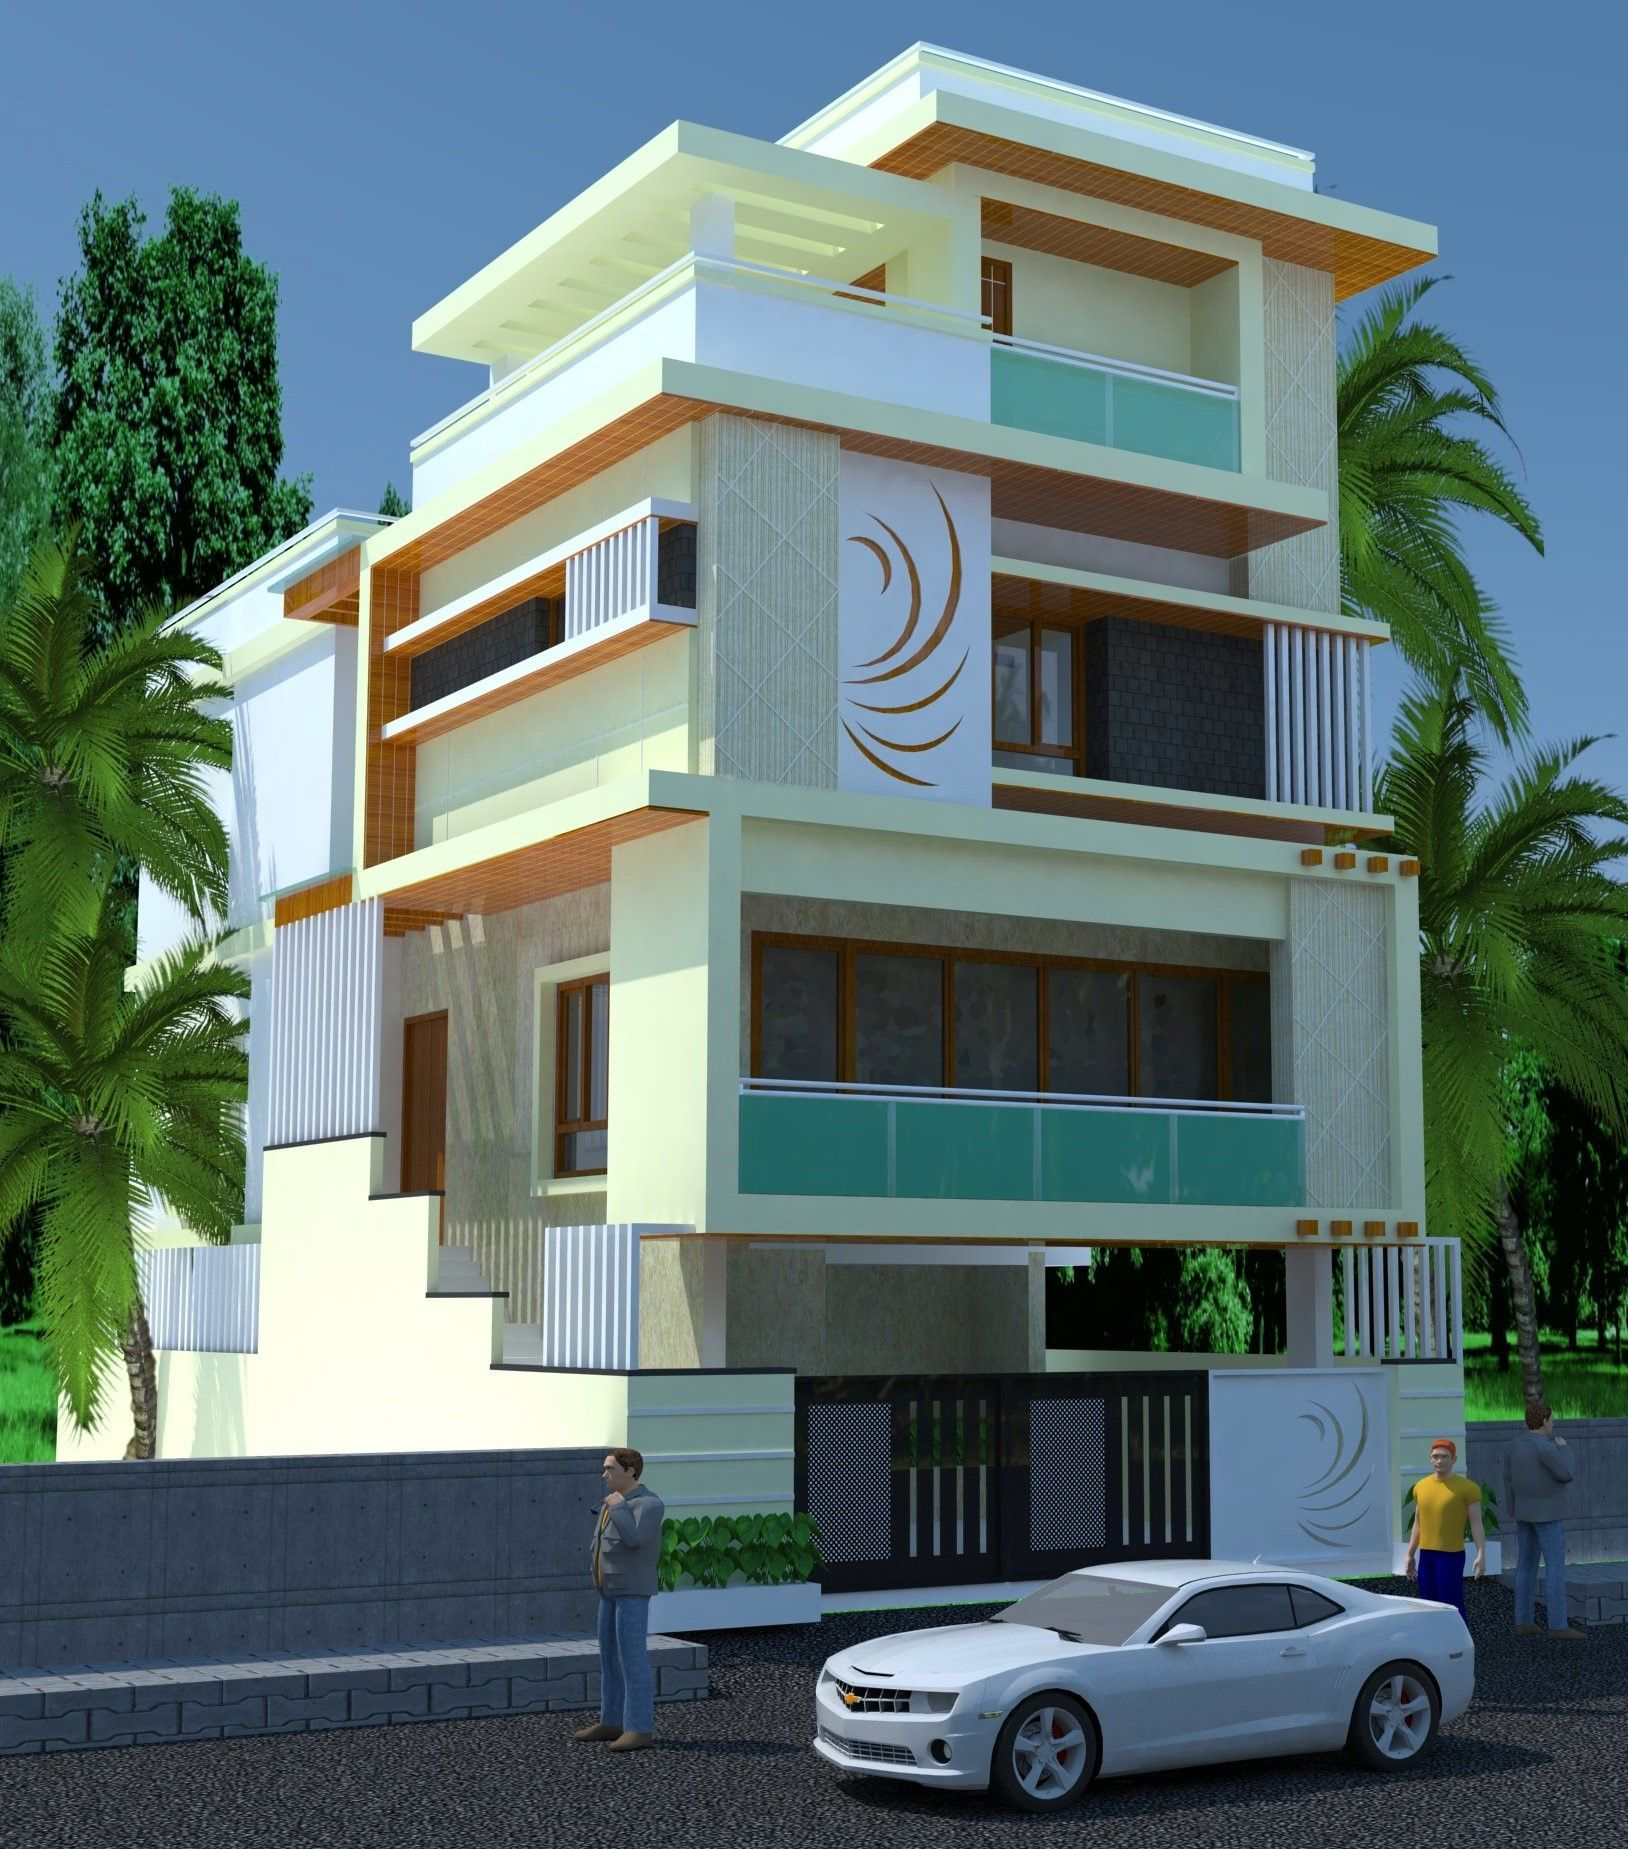 Exteriorhouse Wall Design: Exterior Design , House Styles, Design